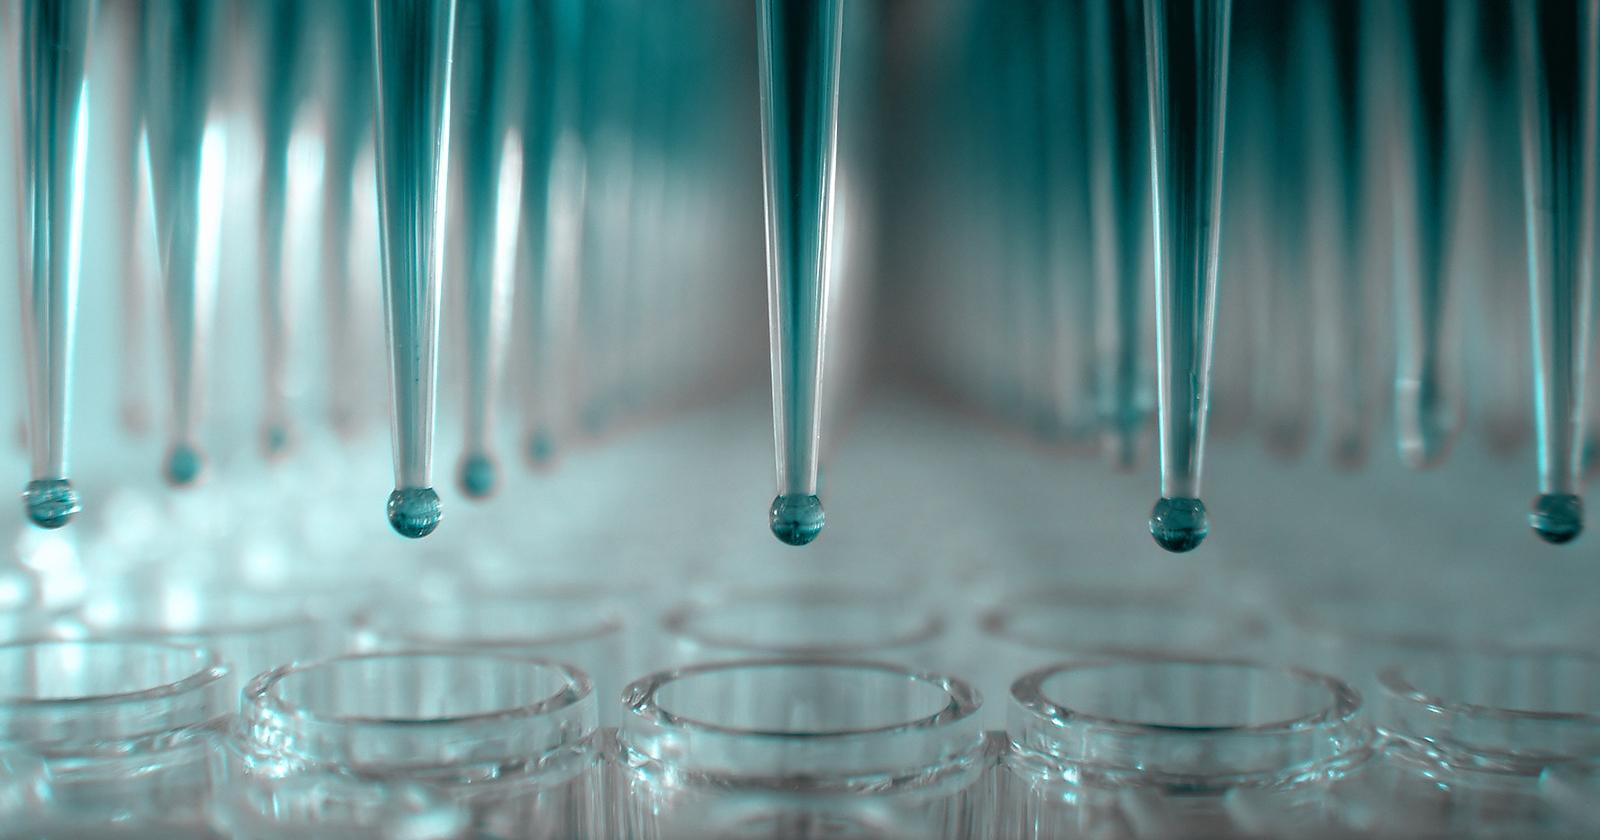 Next-Gen Sequencing